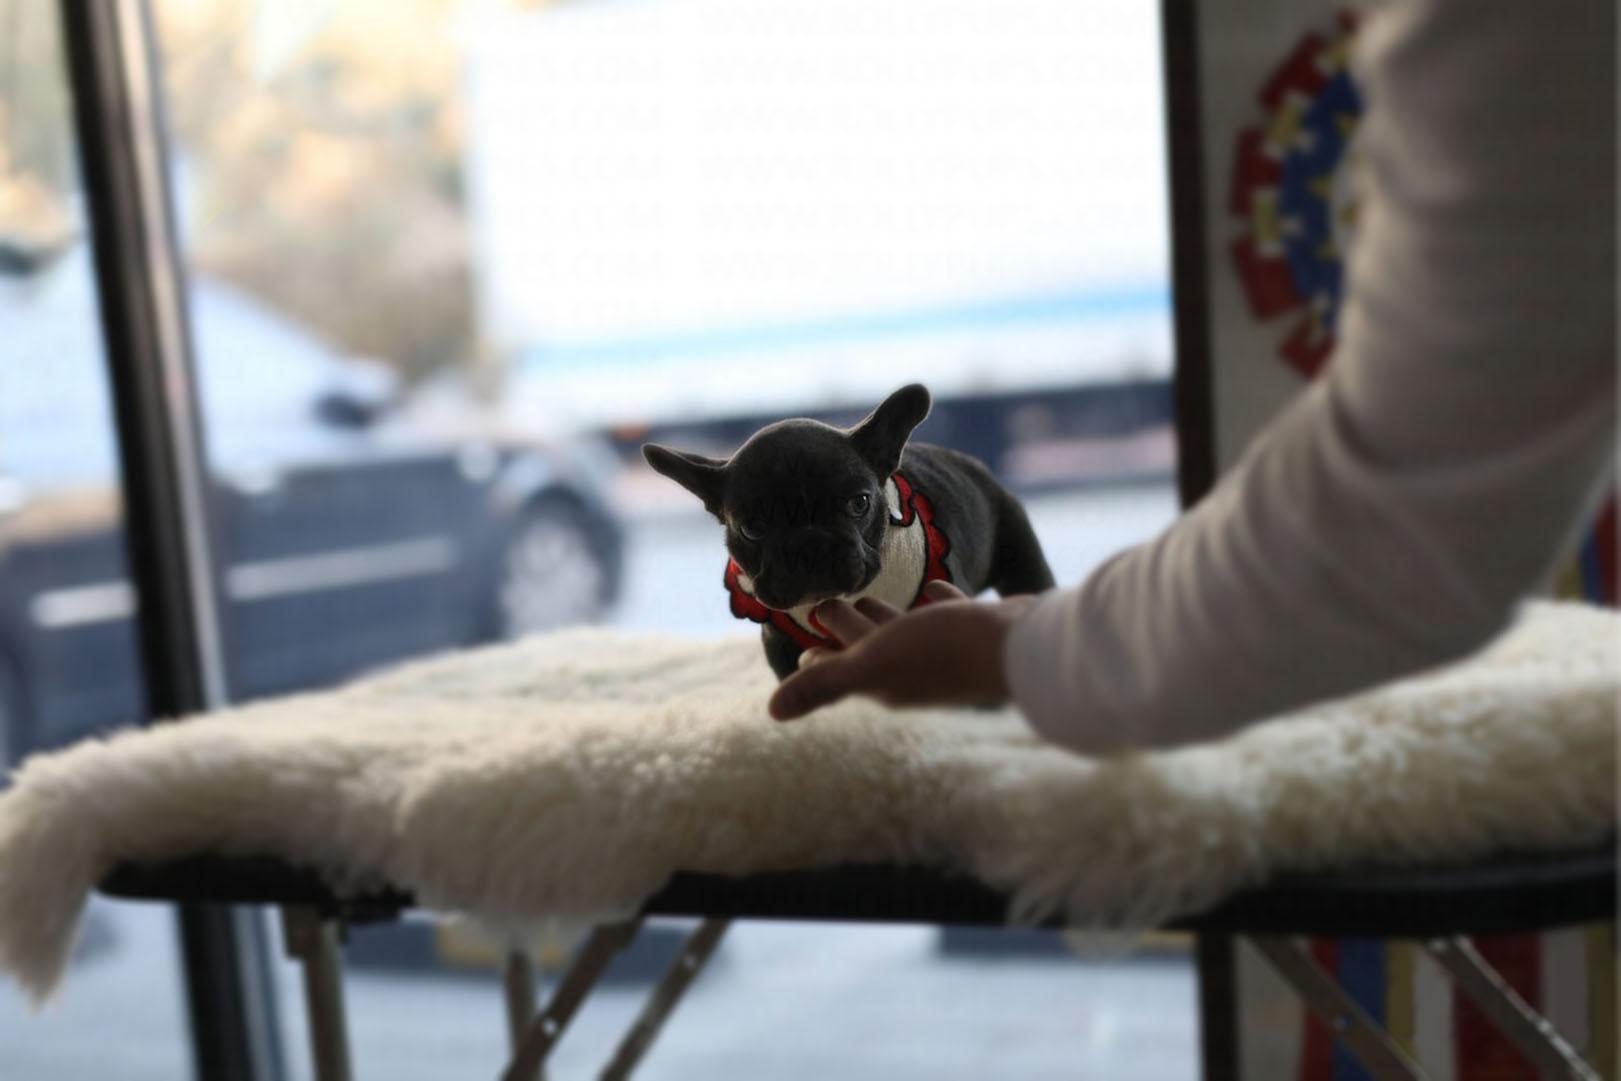 Aloha Teacup French Bulldog for Sale